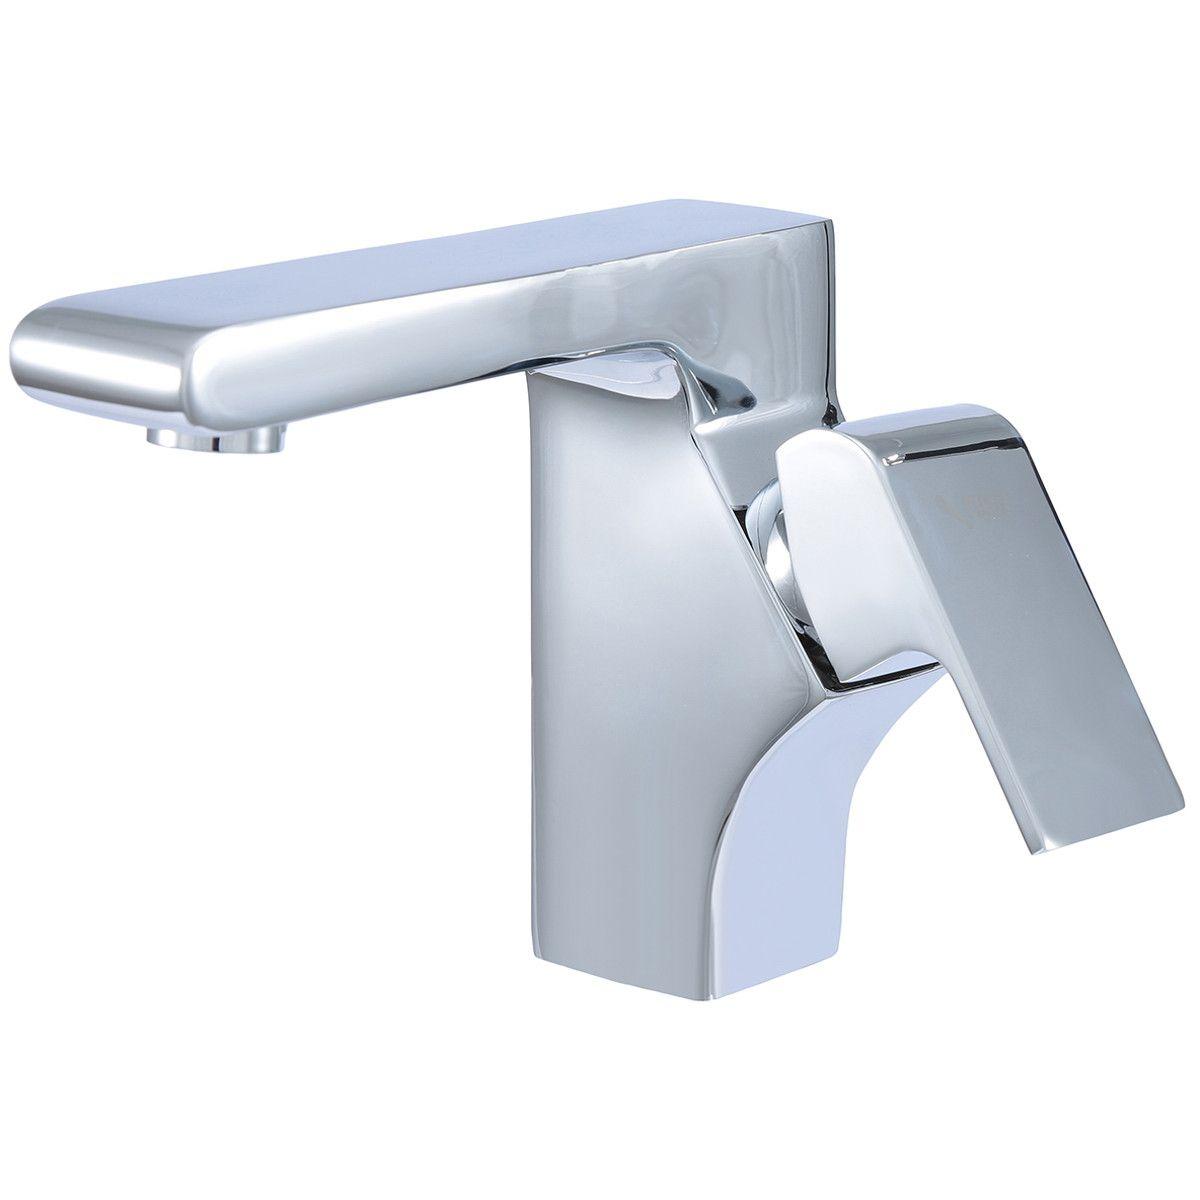 Injoy Wash Basin Bathroom Faucet  #decor #unitedarabemirates #wallaccents #homeevolution #dubailife #frame #home #homeandgarden #ArchedFloorLamp #furniture #art #calligraphy #hevo #mydubai #lighting